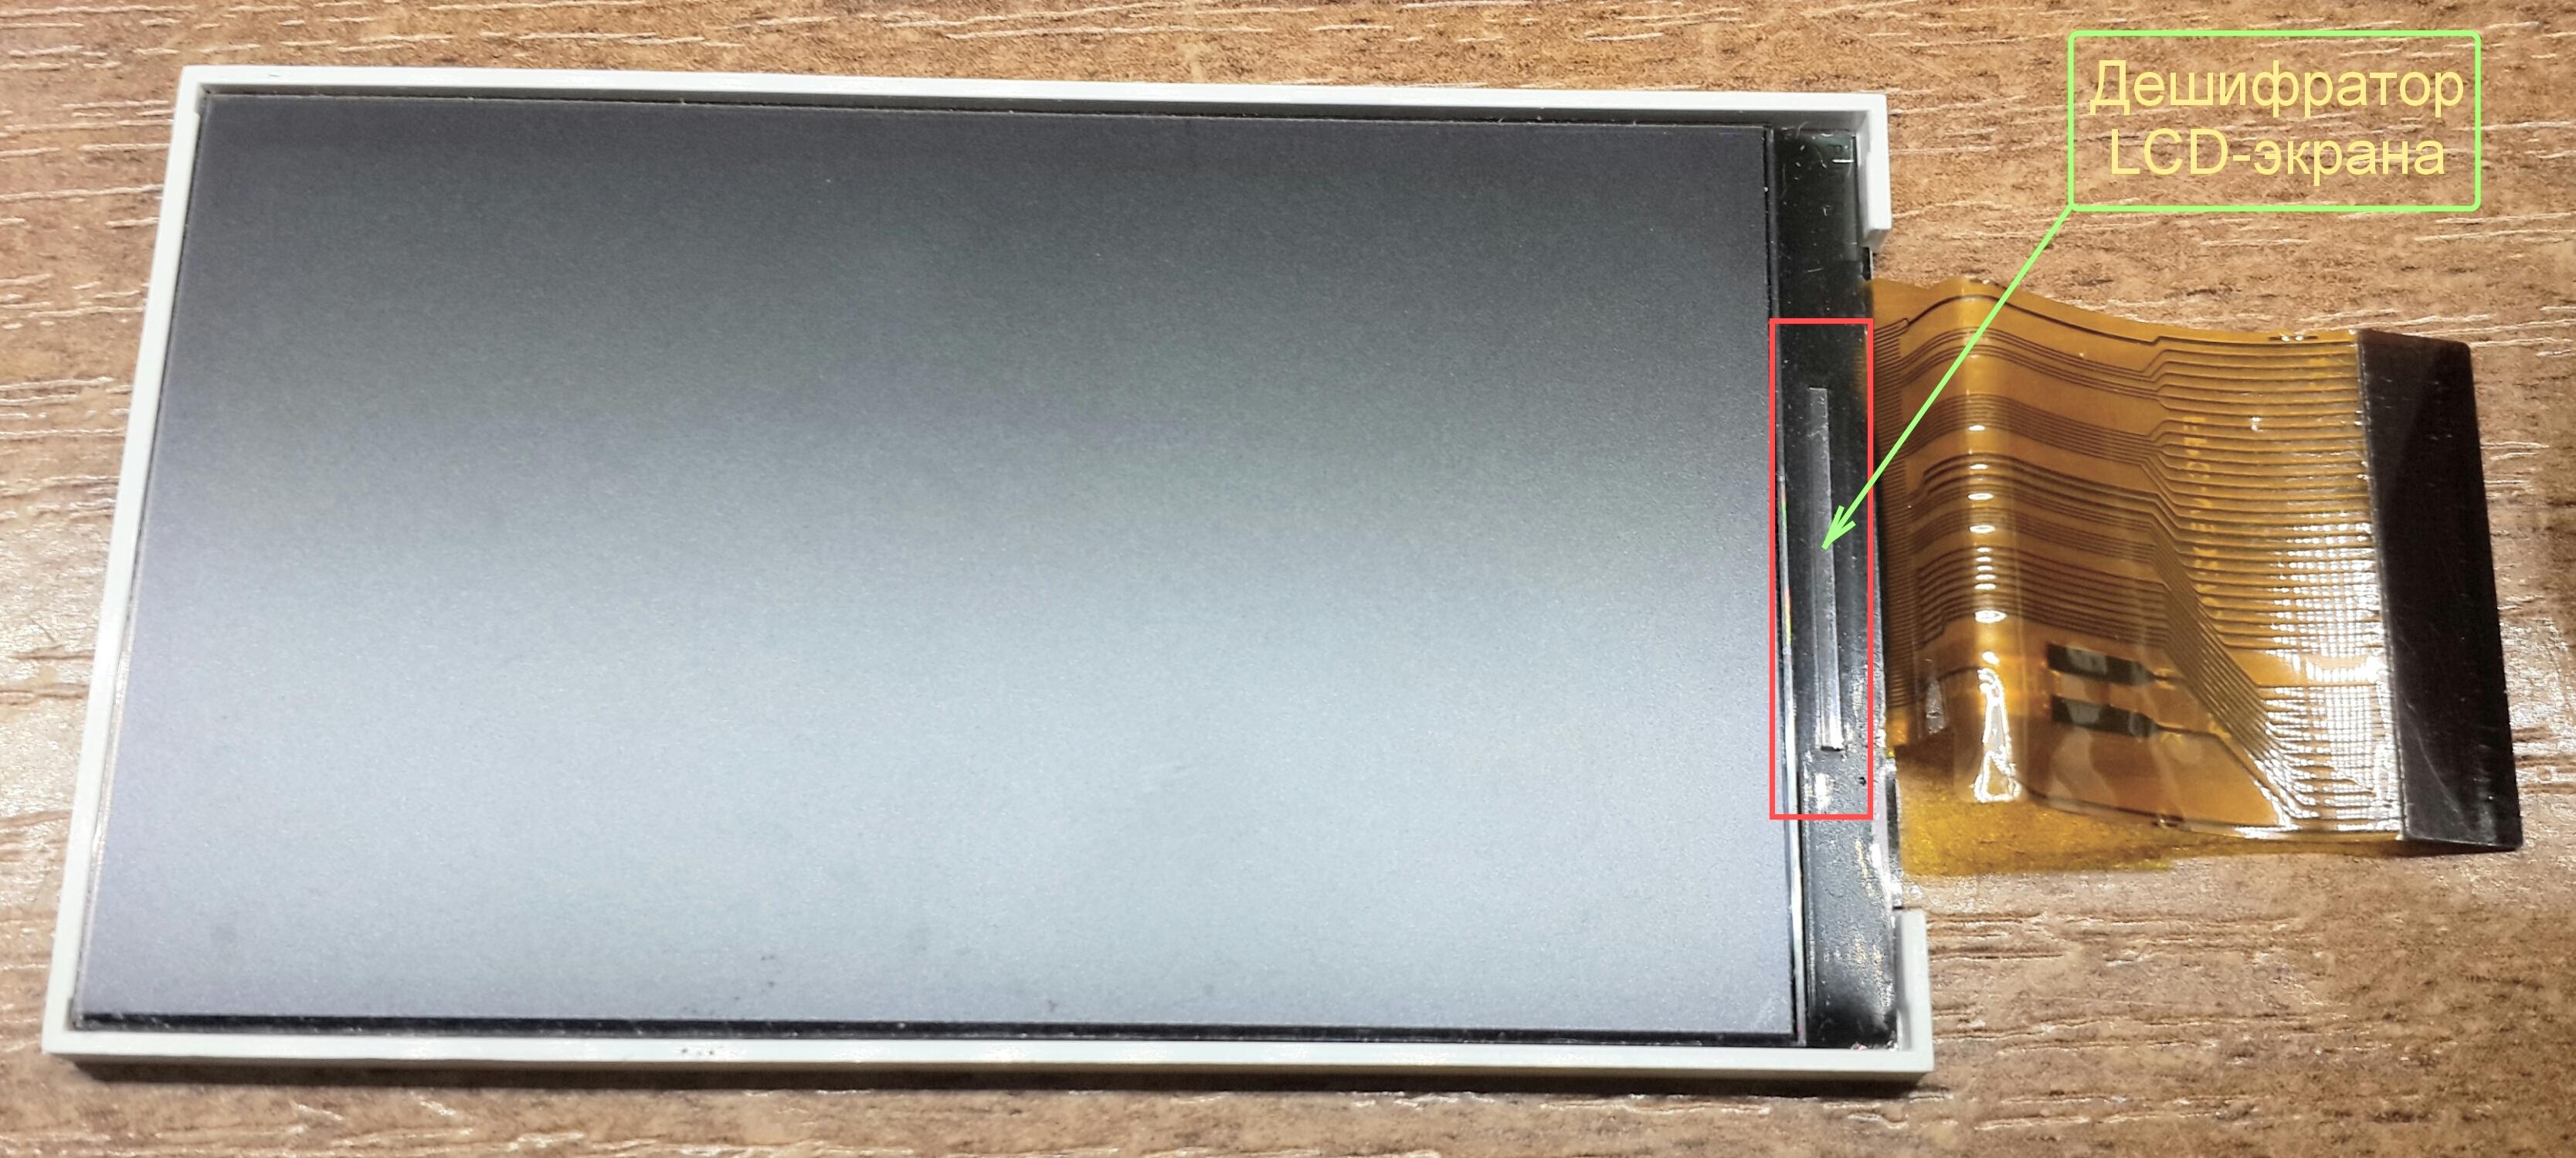 ЖК-экран FPC-VS027CIN32V3. Вид спереди.